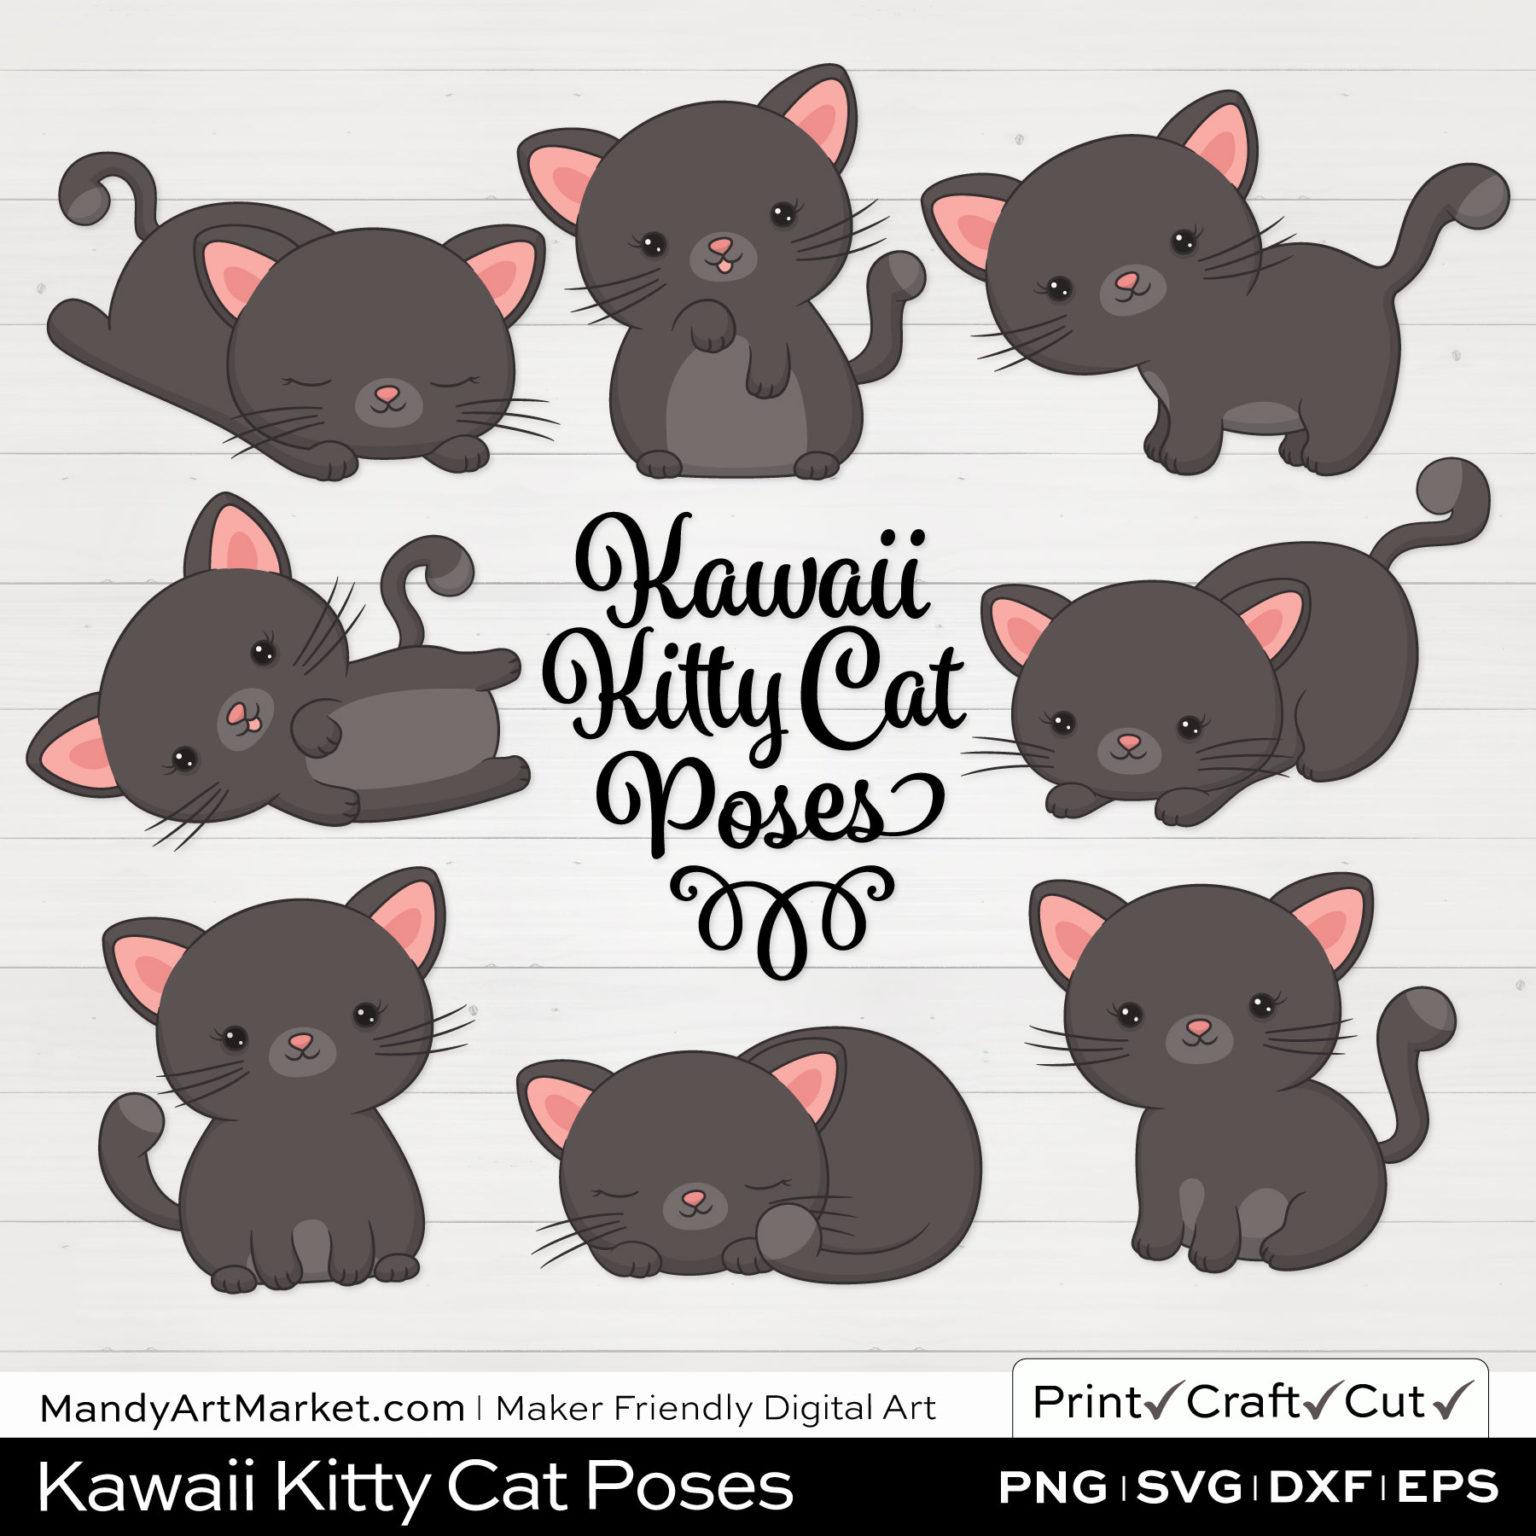 Gunmetal Gray Kawaii Kitty Cat Poses Clipart on White Background